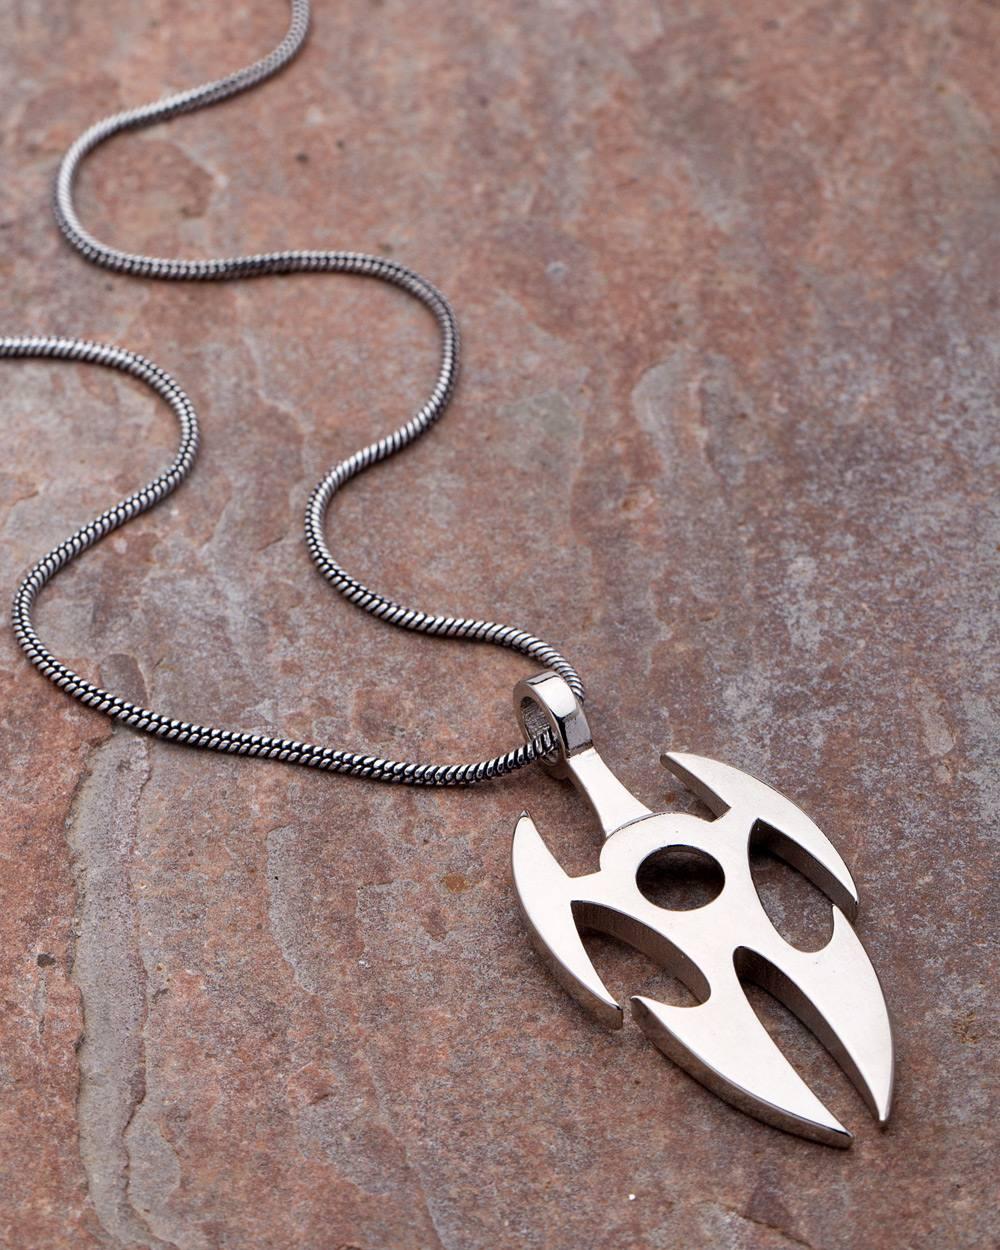 Buy dare by voylla designer silver plated pendant with chain for men dare by voylla designer silver plated pendant with chain for men aloadofball Choice Image